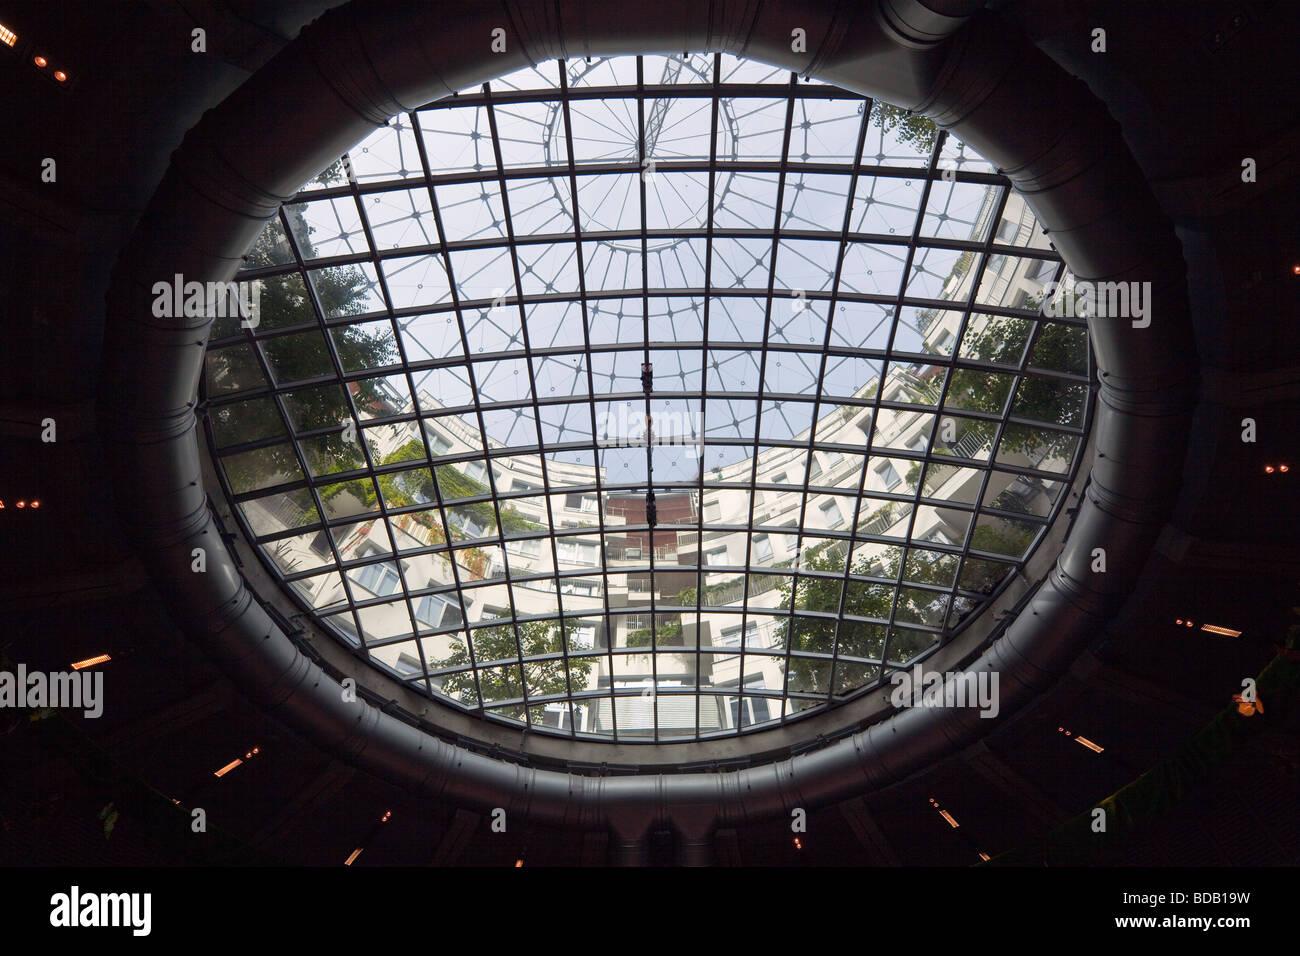 interior of Gasometer, Gasometer City, Simmering, Vienna, Austria - Stock Image